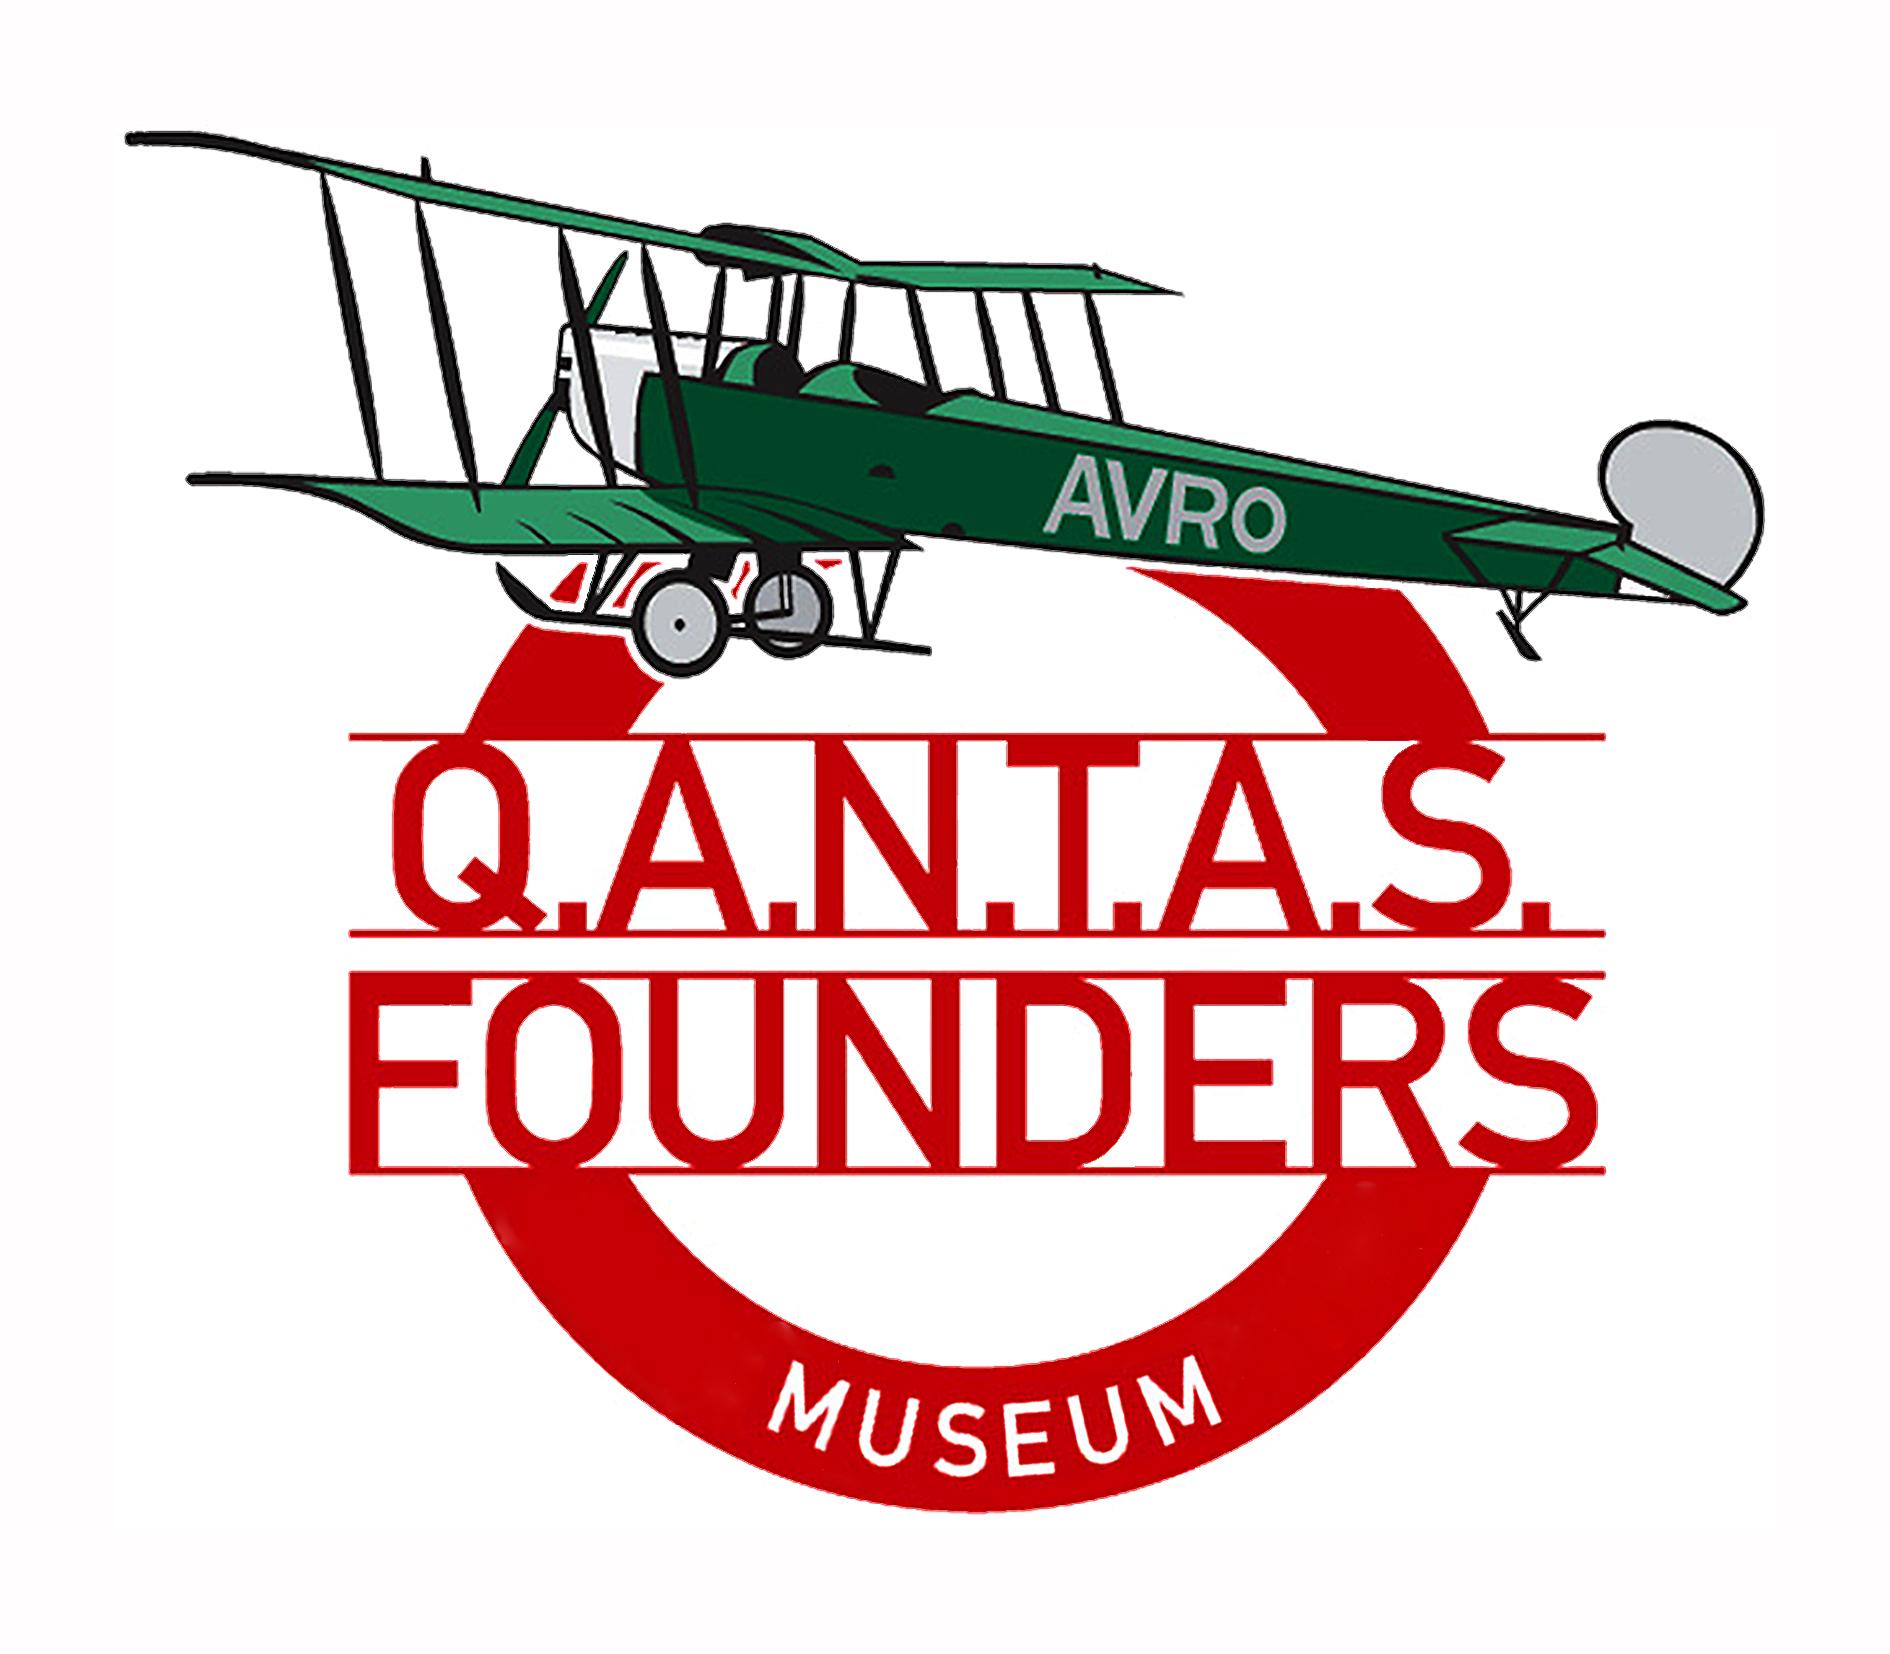 Qantas Founders Museum.